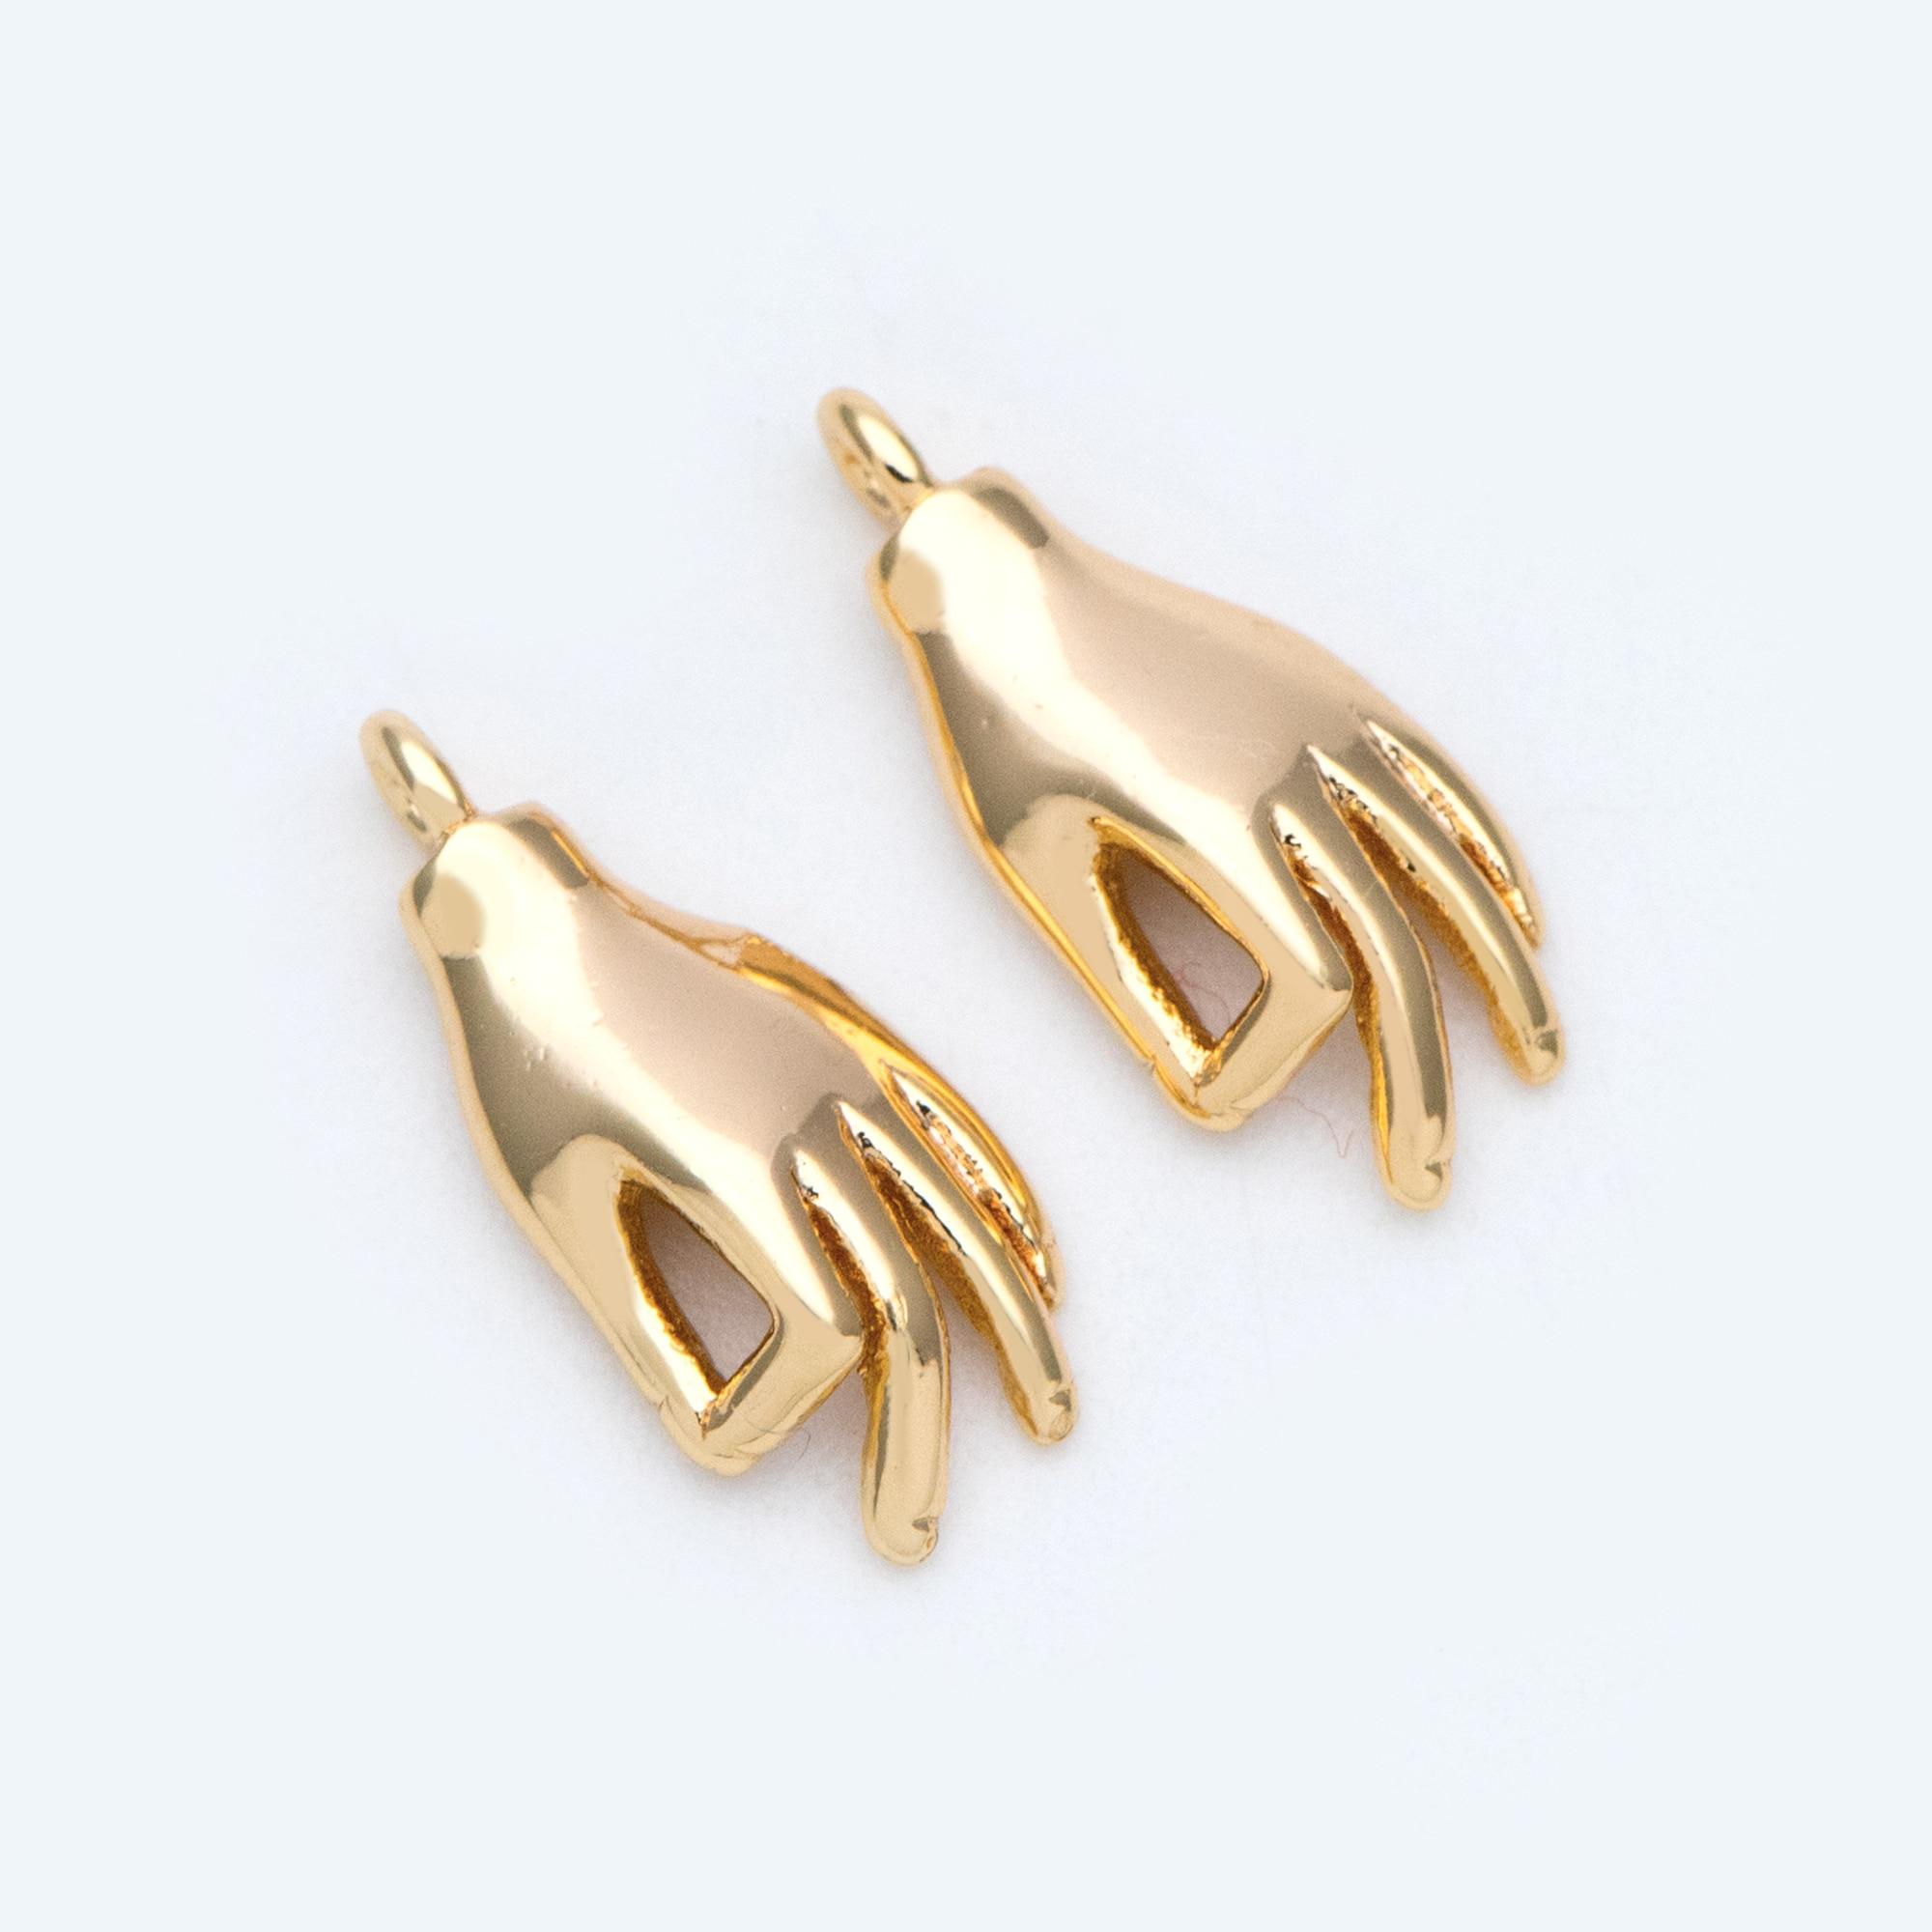 10pcs Gold Plated Brass Hand Charm, OK / Okay Gesture Pendants 15x7mm (GB-935)